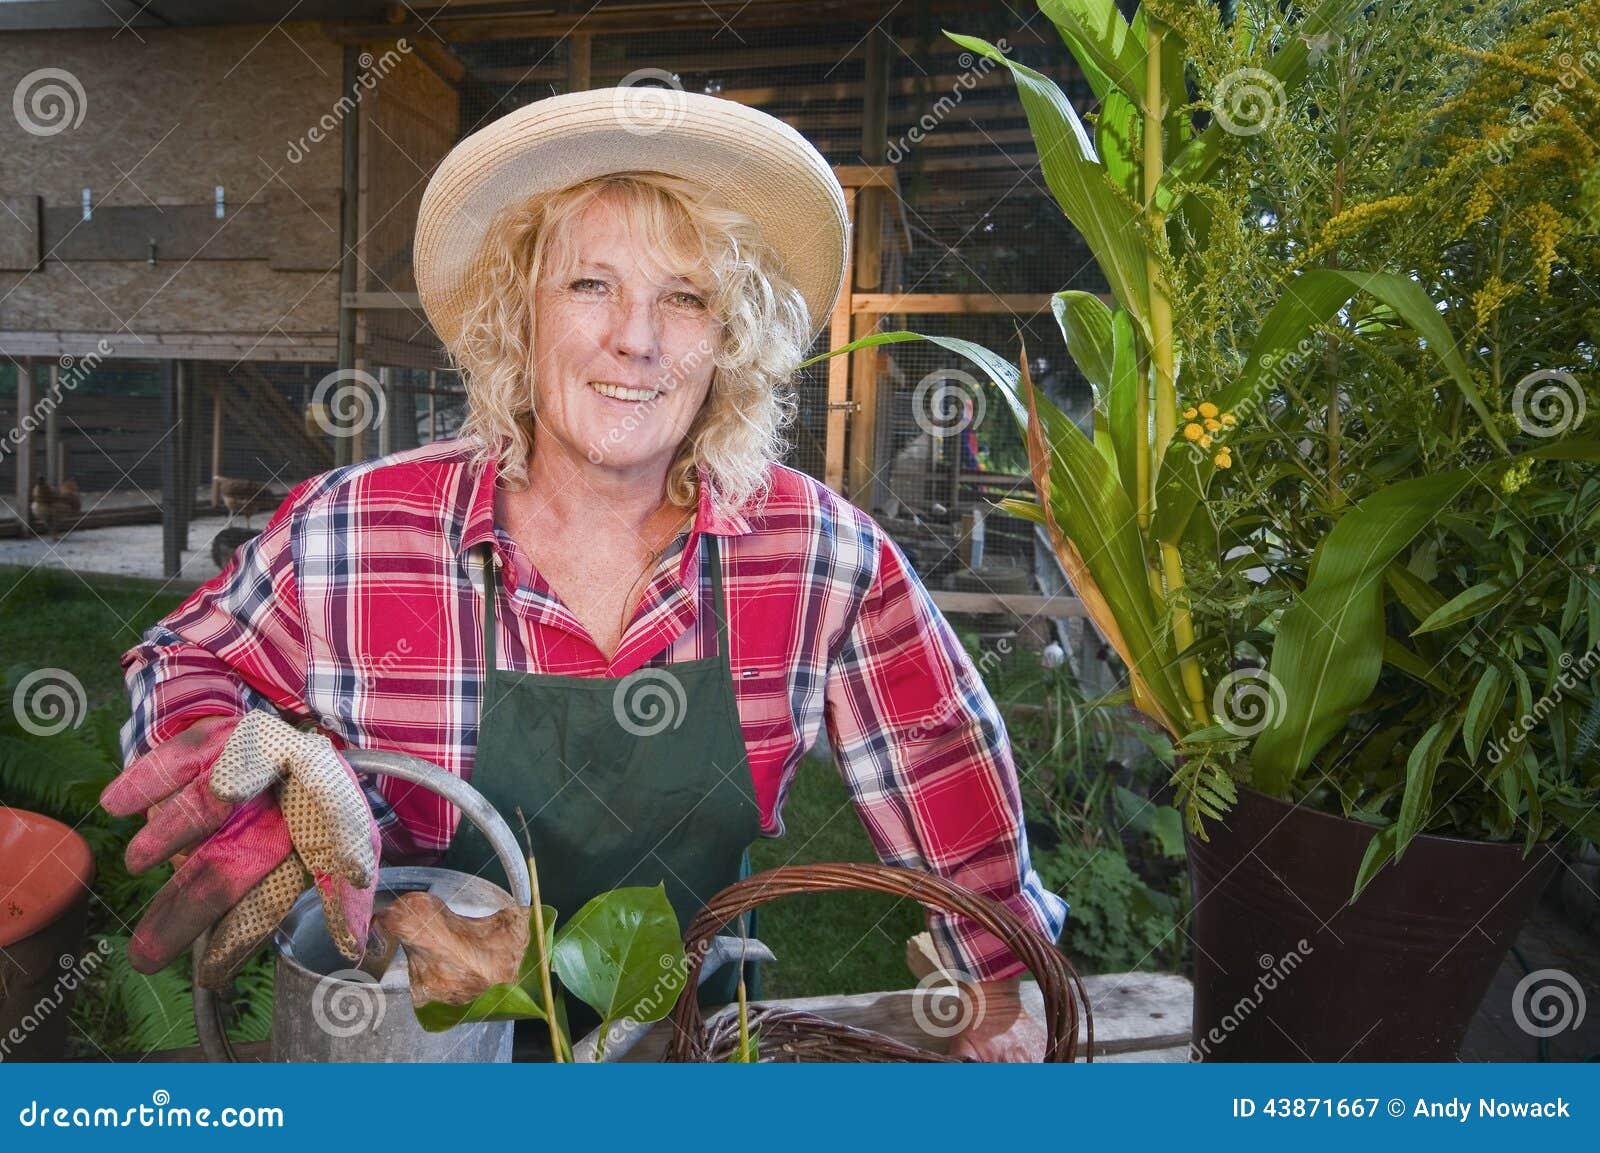 Smiling Female Gardener Stock Photo Image 43871667